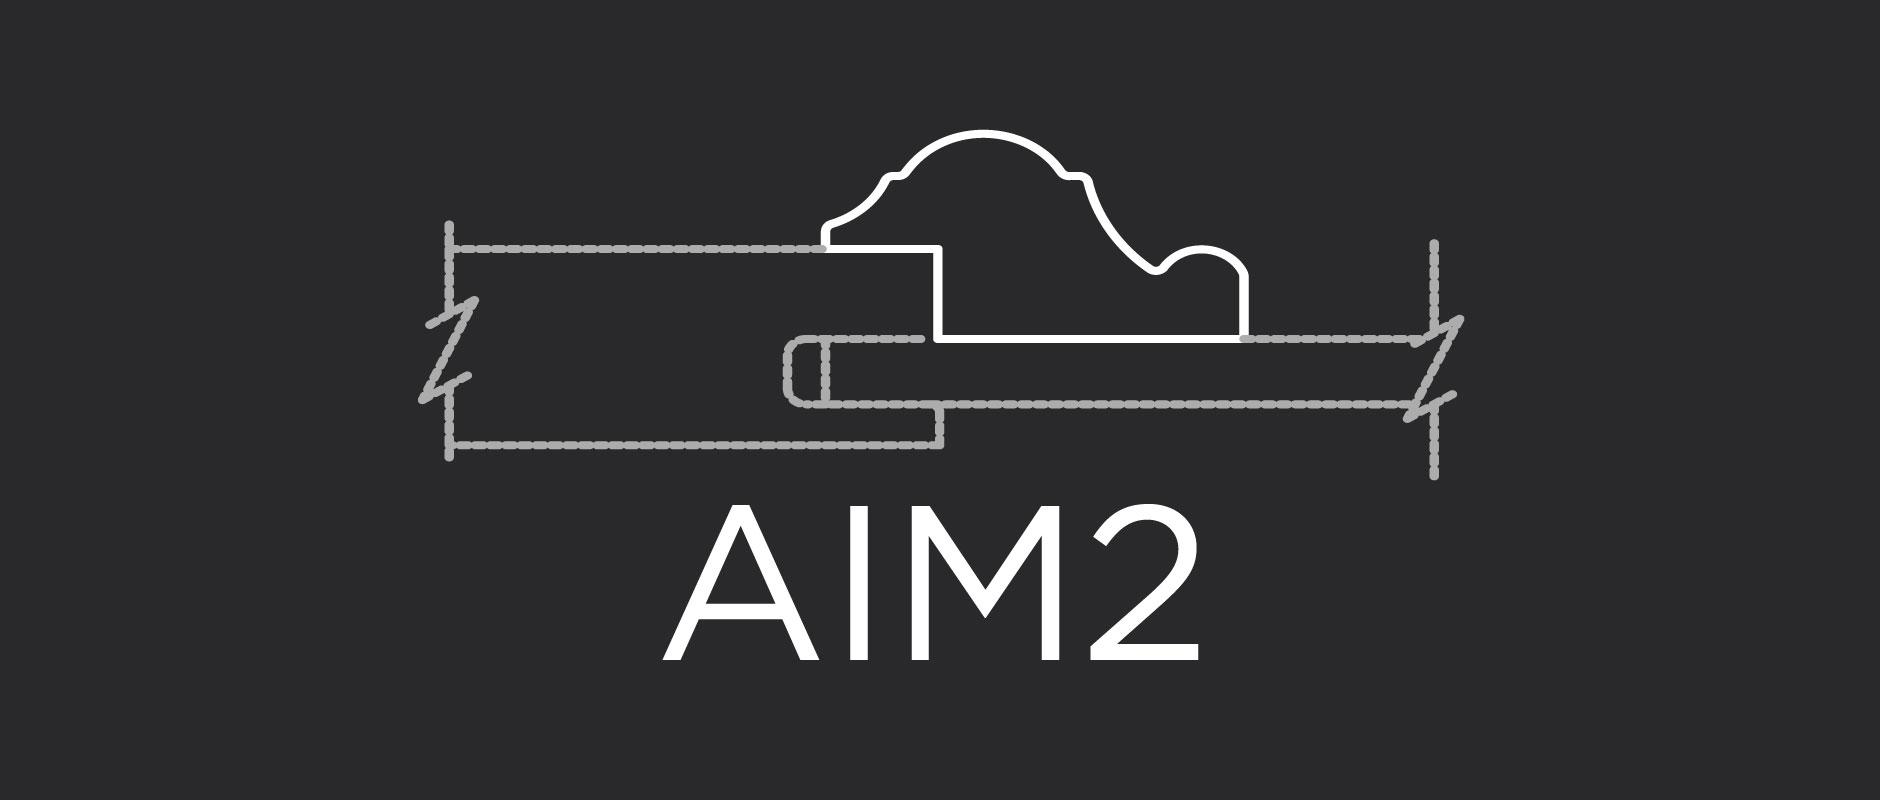 AIM2 inside-edge applied molding